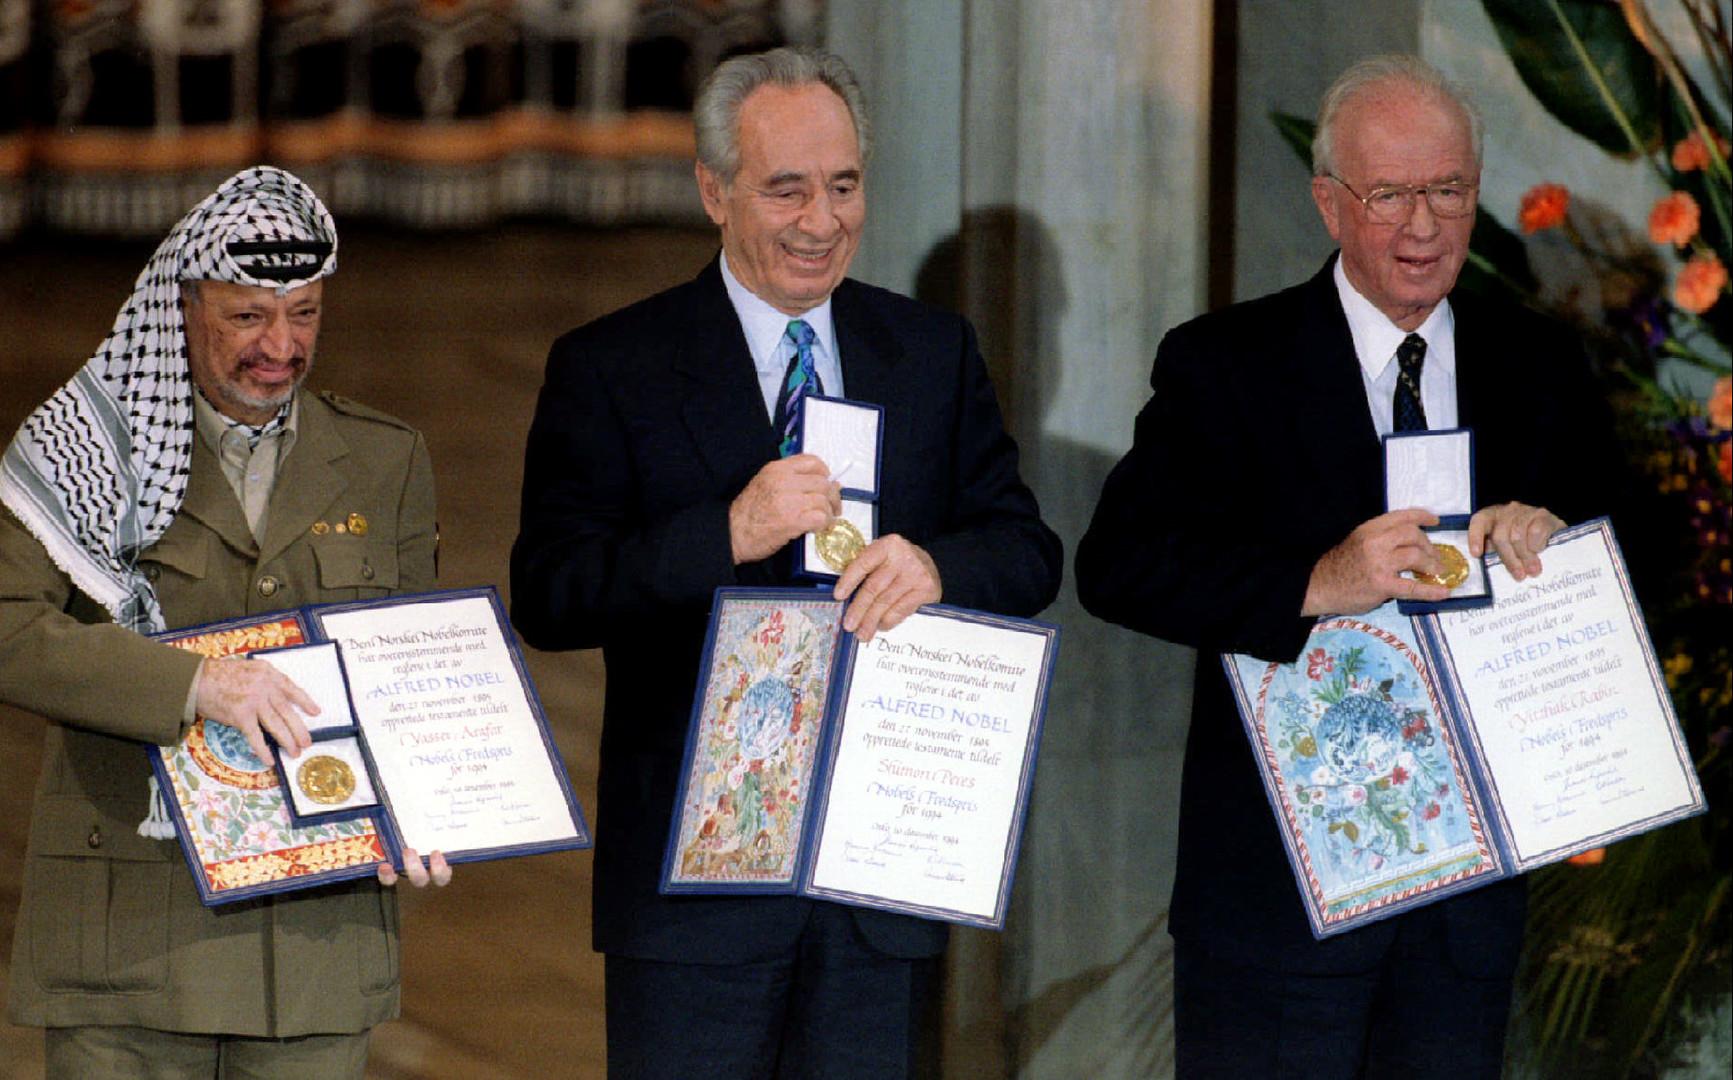 Yasser Arafat, Shimon Peres et Yitzhak Rabin montrent leurs prix Nobel